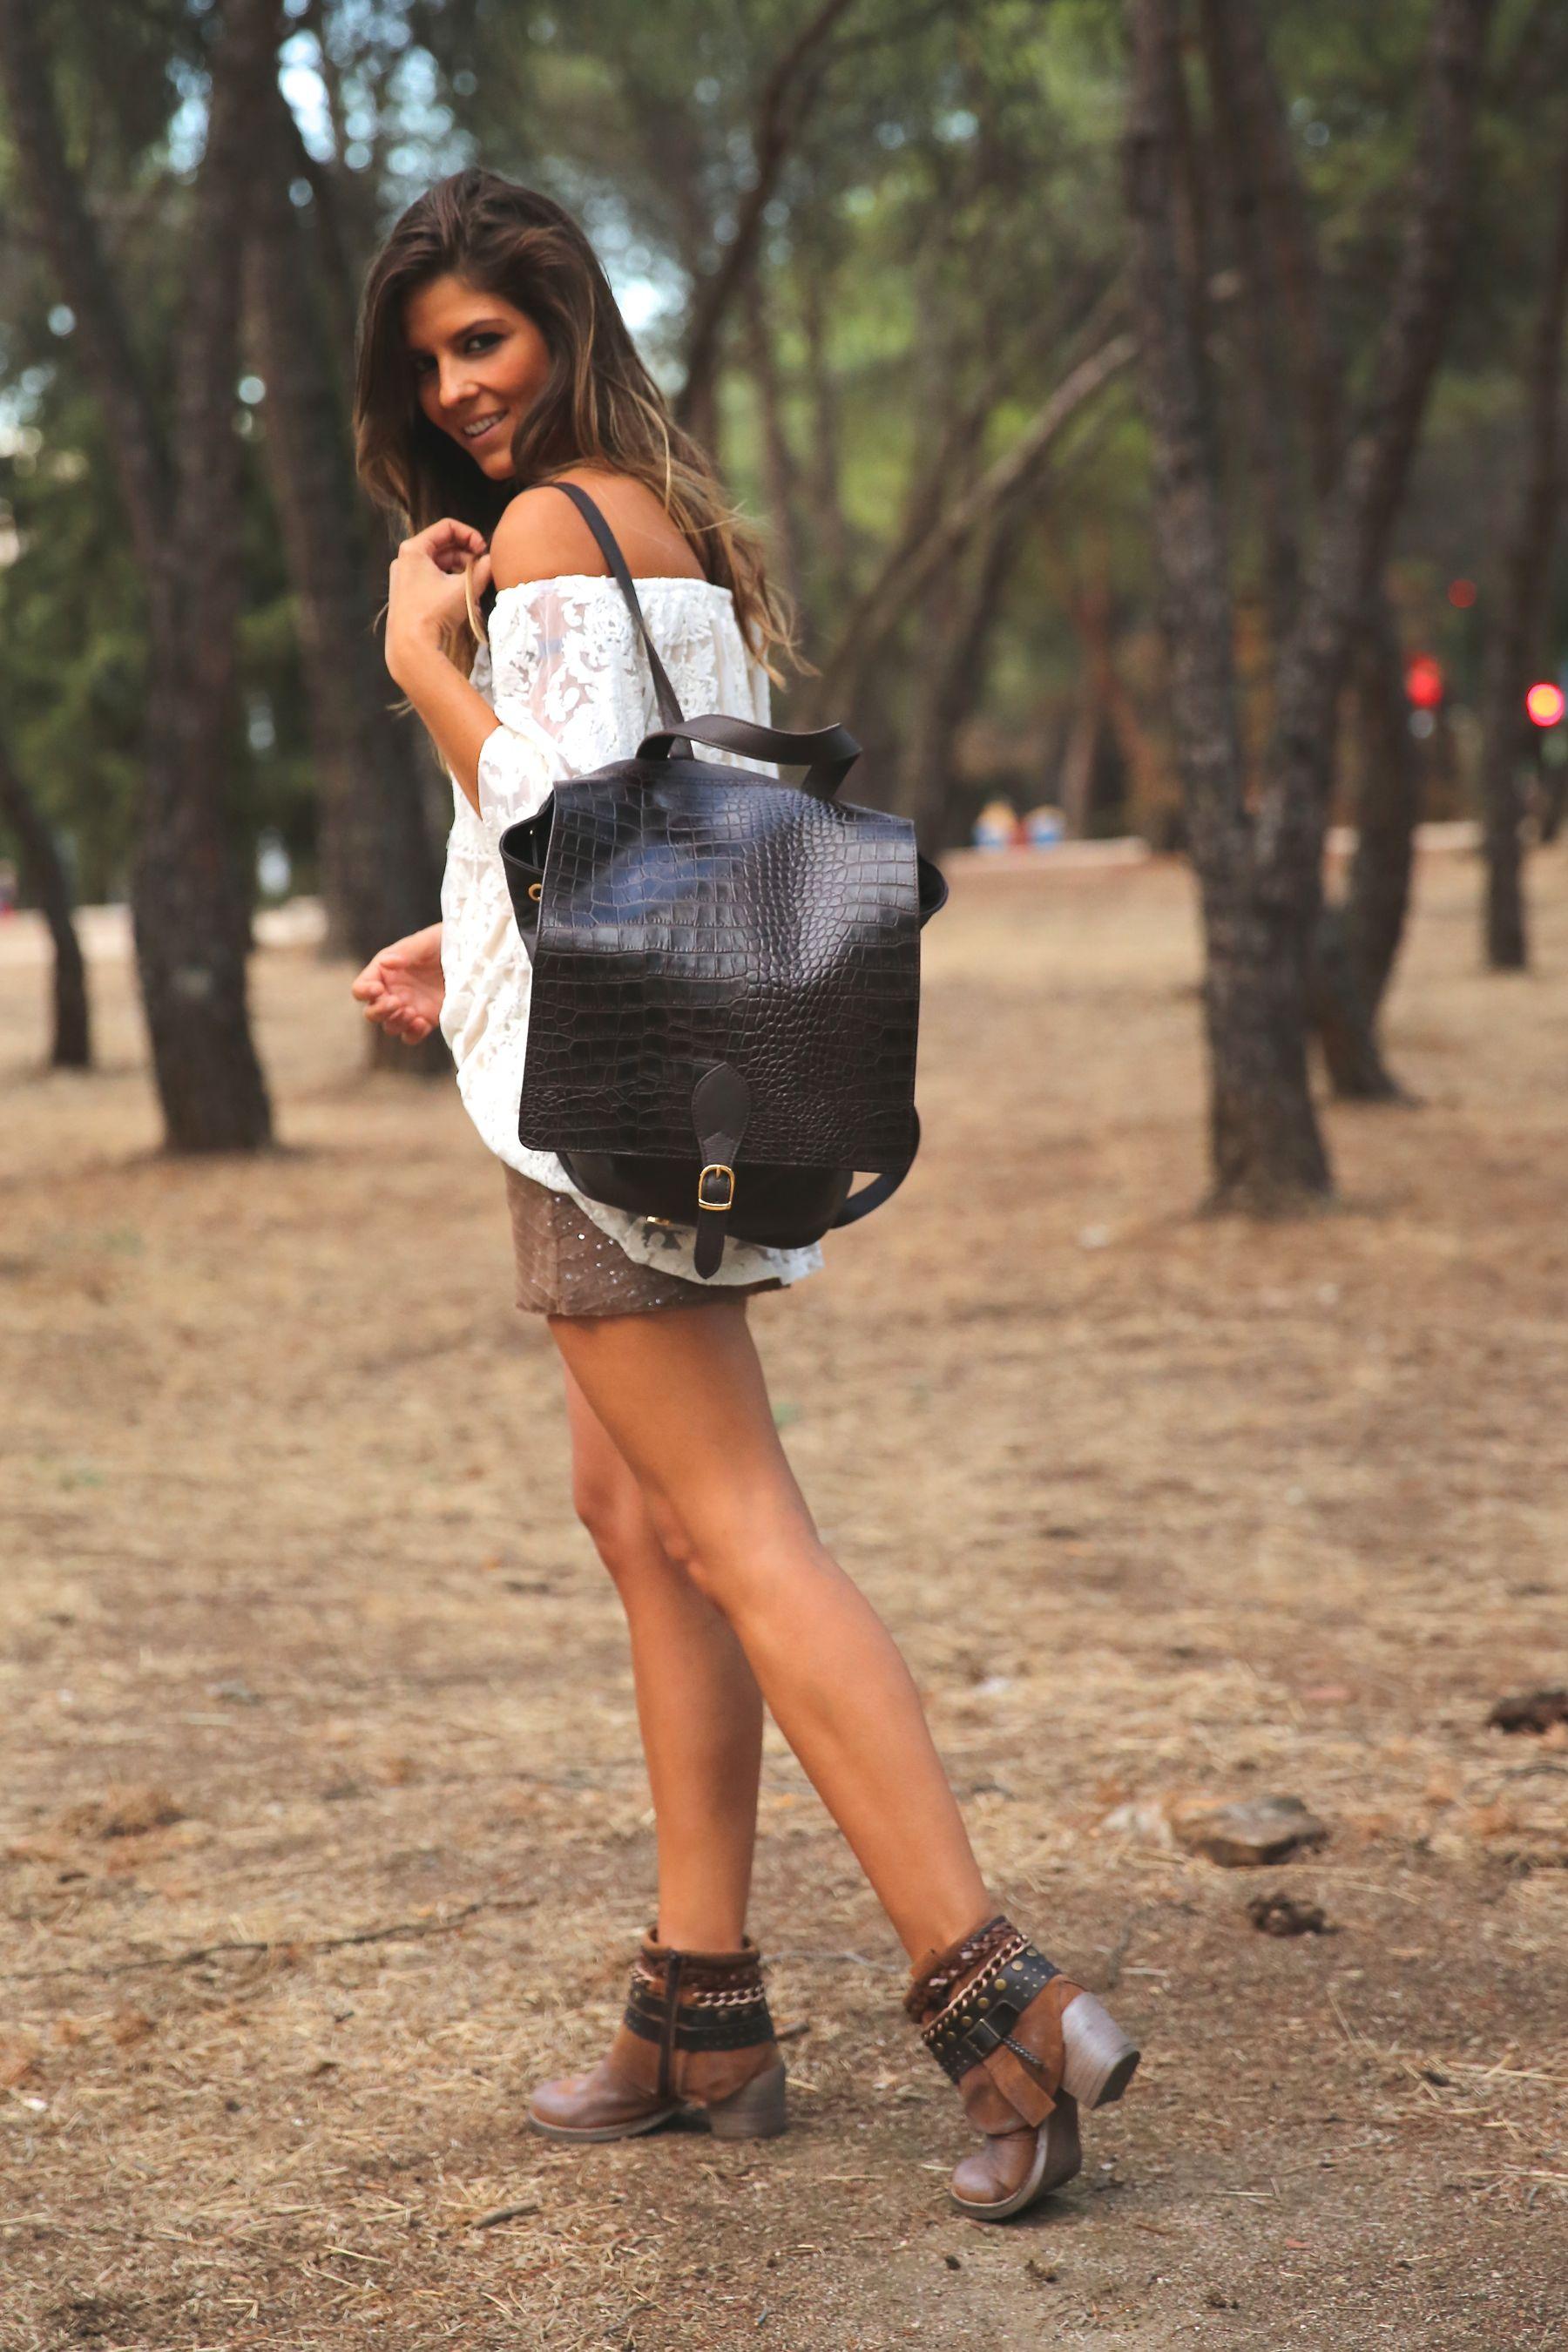 trendy_taste-look-outfit-street_style-ootd-blog-blogger-fashion_spain-moda_españa-primavera/verano-boho-trendy-planes_de_día-lentejuelas-falda-botines-étnico-mochila-crochet-encaje-9